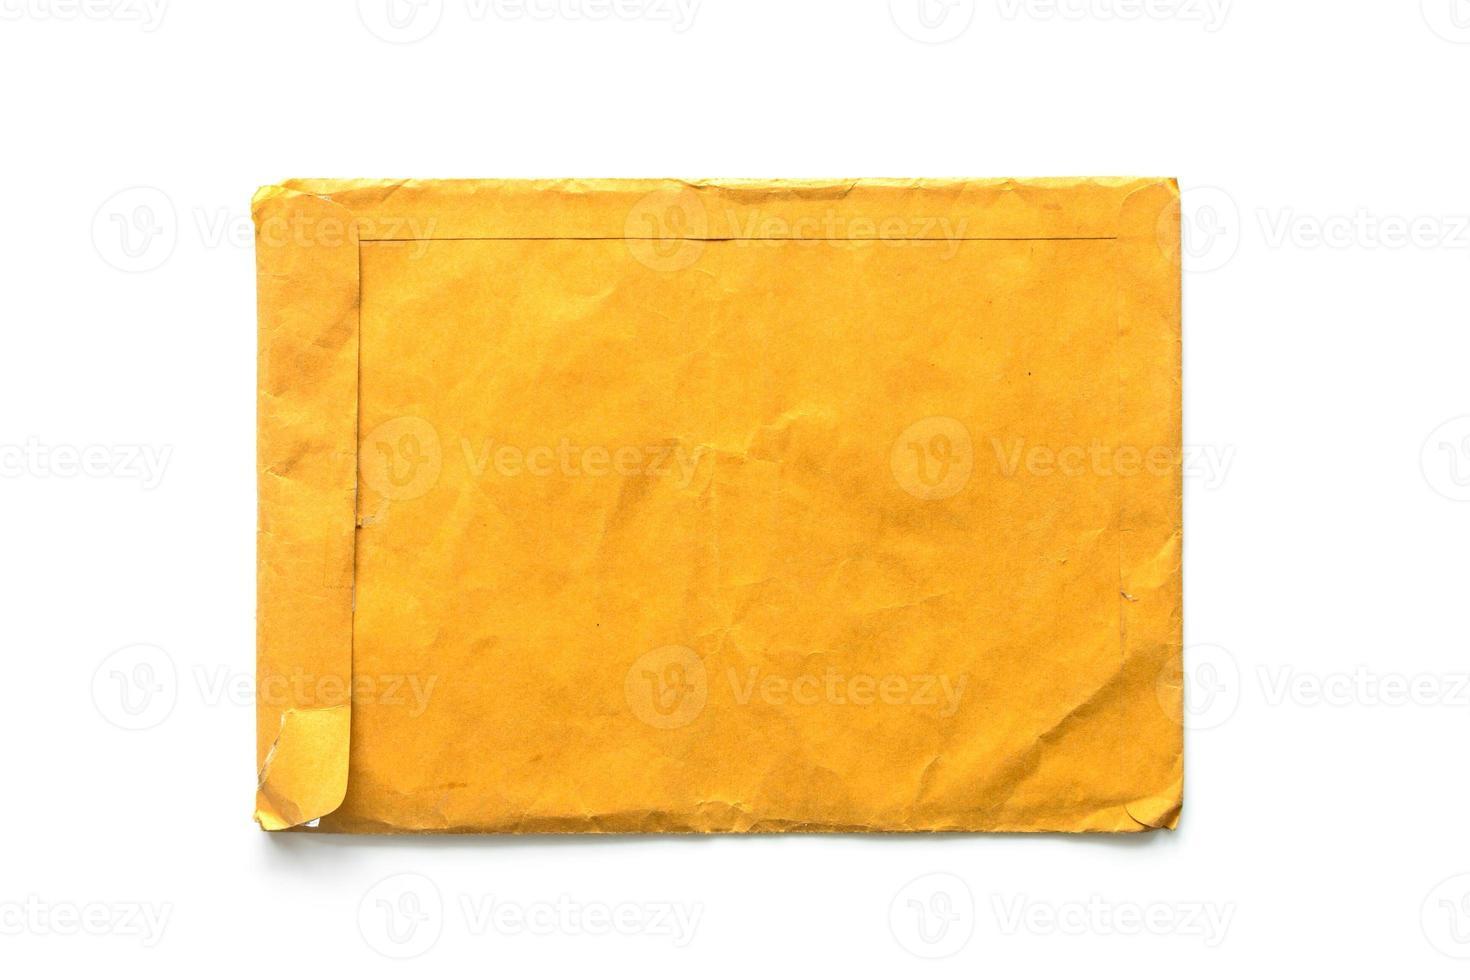 document enveloppe brune sur fond blanc photo